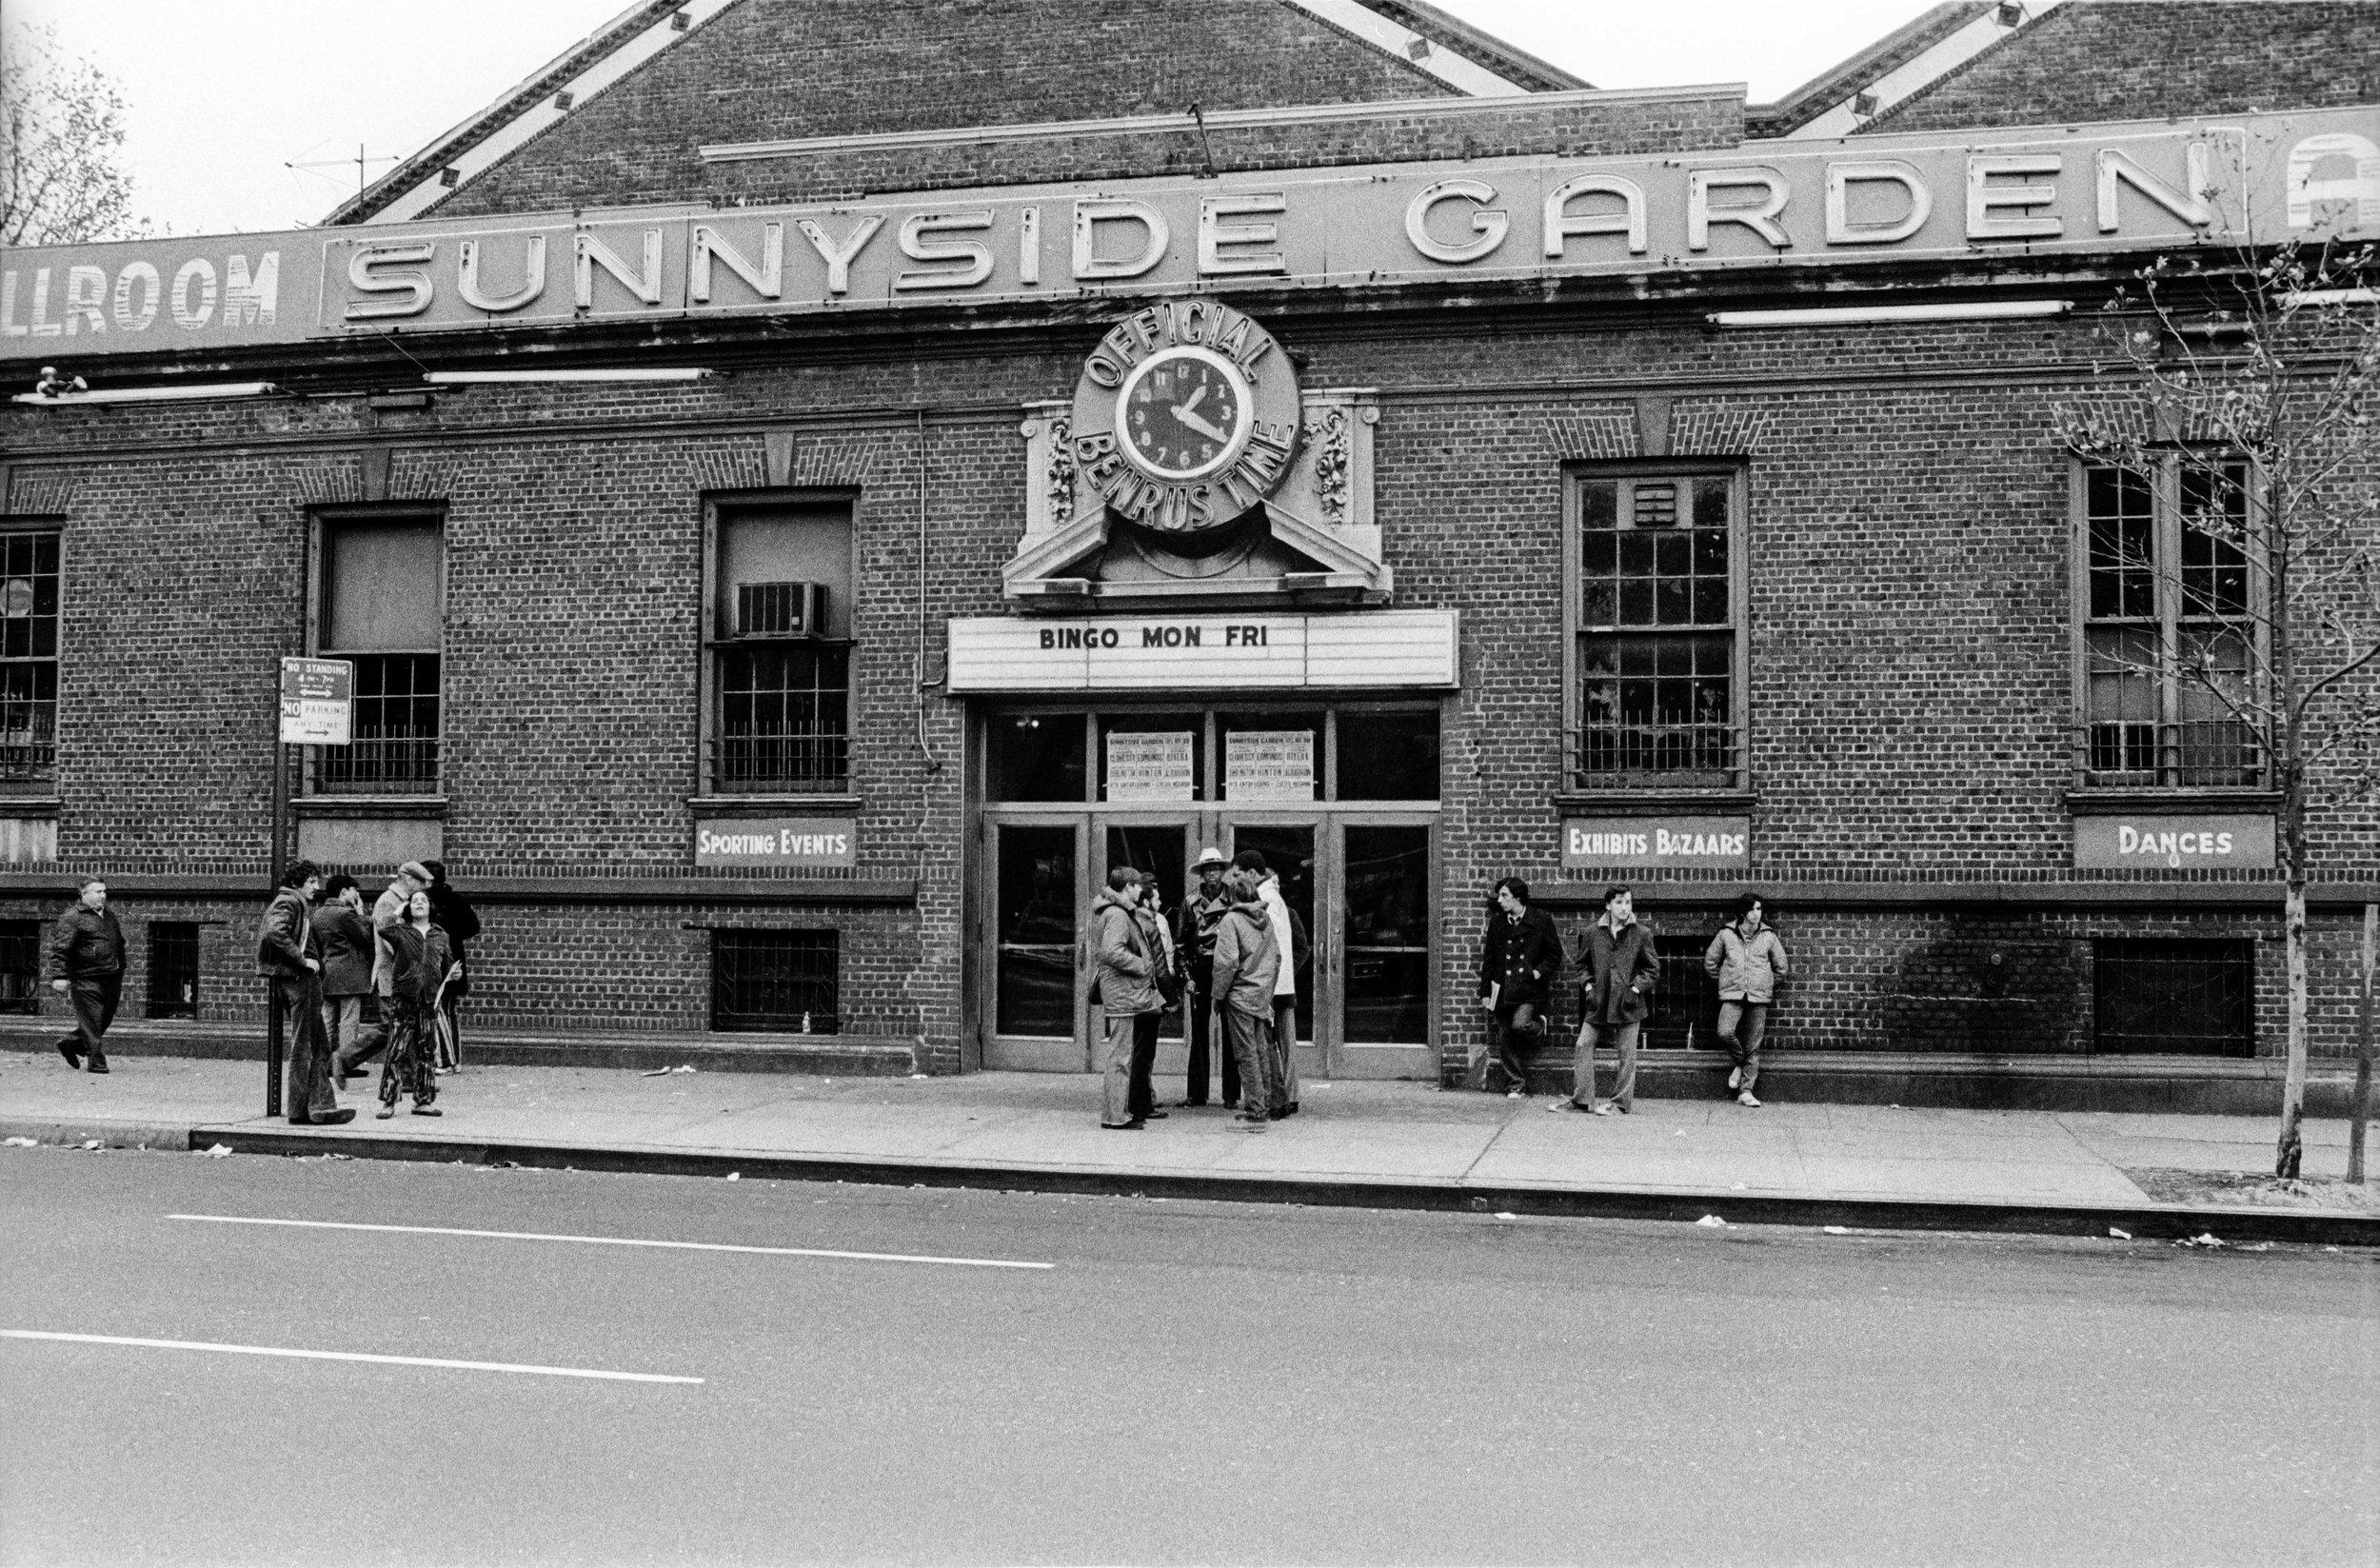 Sunnyside, Queens, NY, 1972